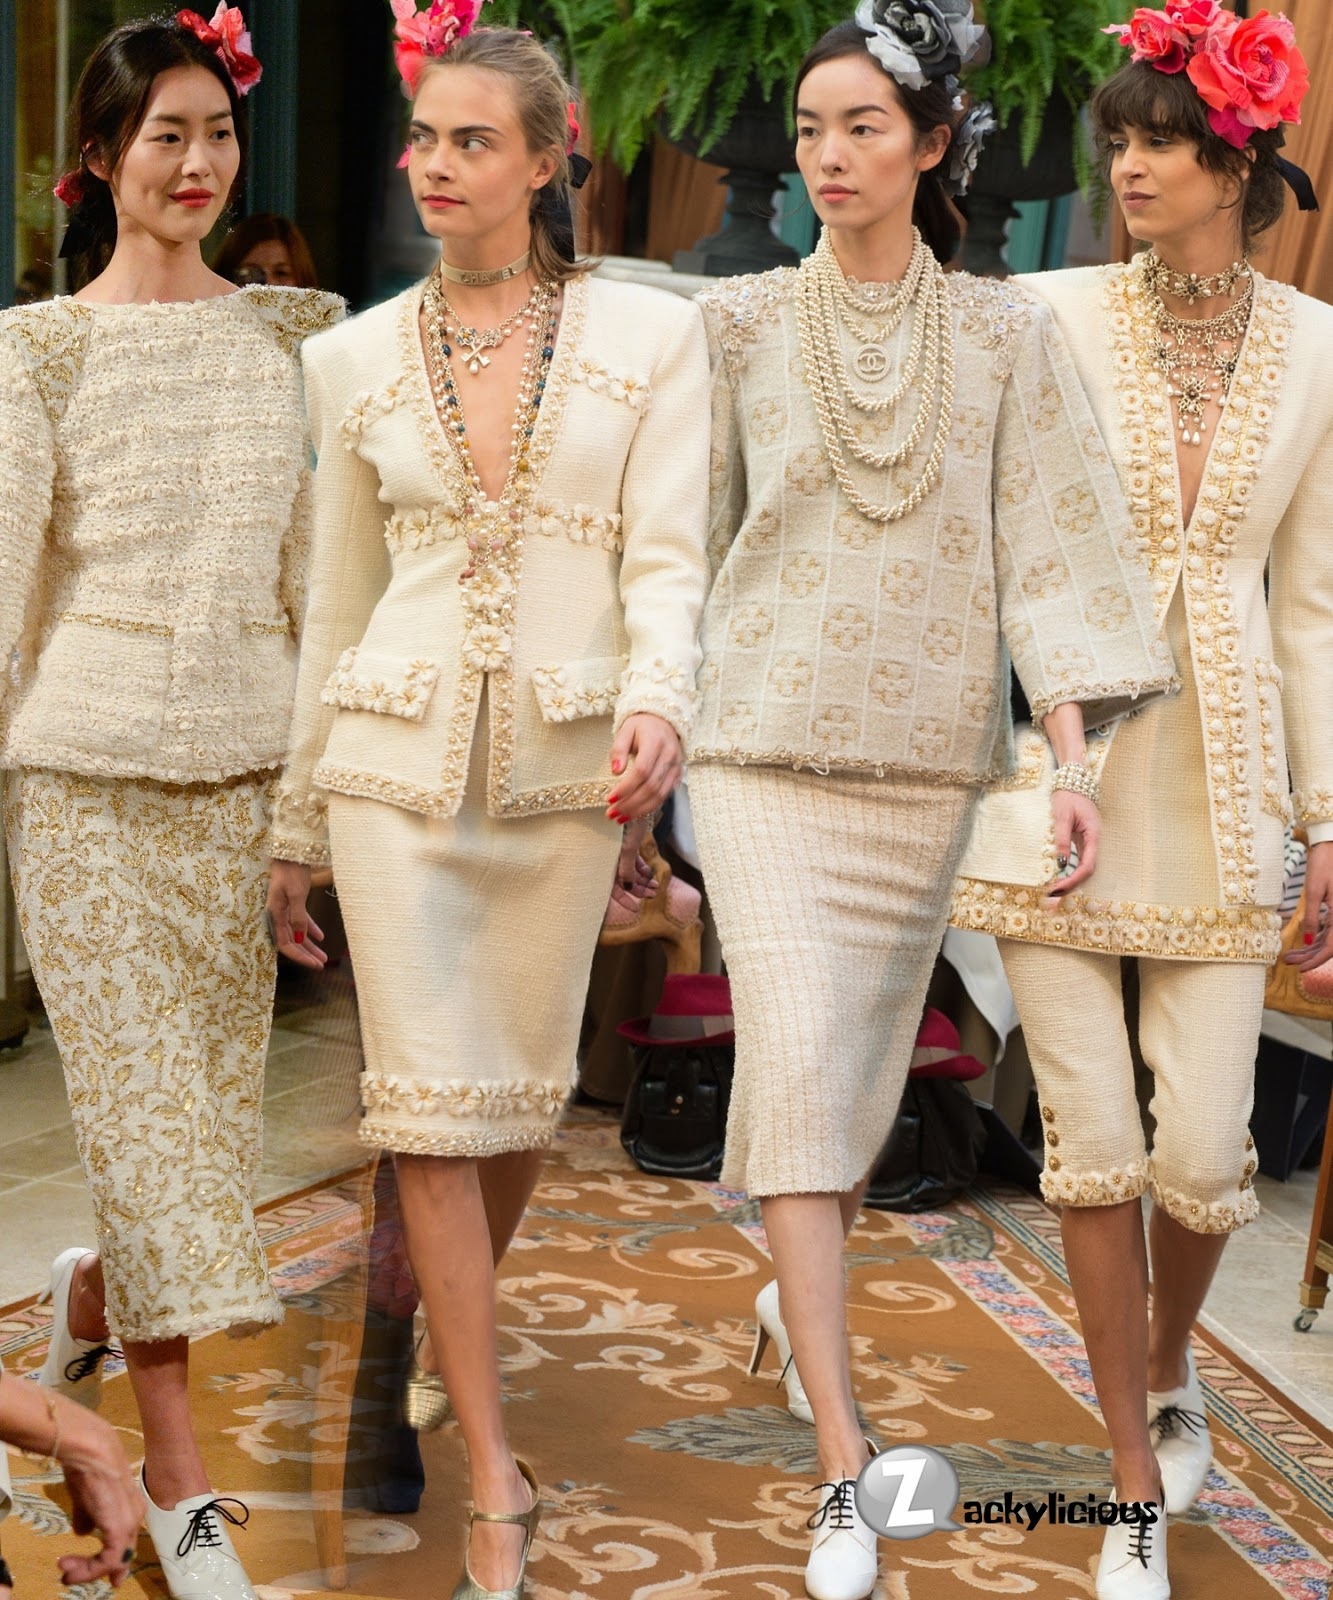 52a15d82f81a Chanel s Métiers d Art 2016.17 Paris Cosmopolite - Zackylicious